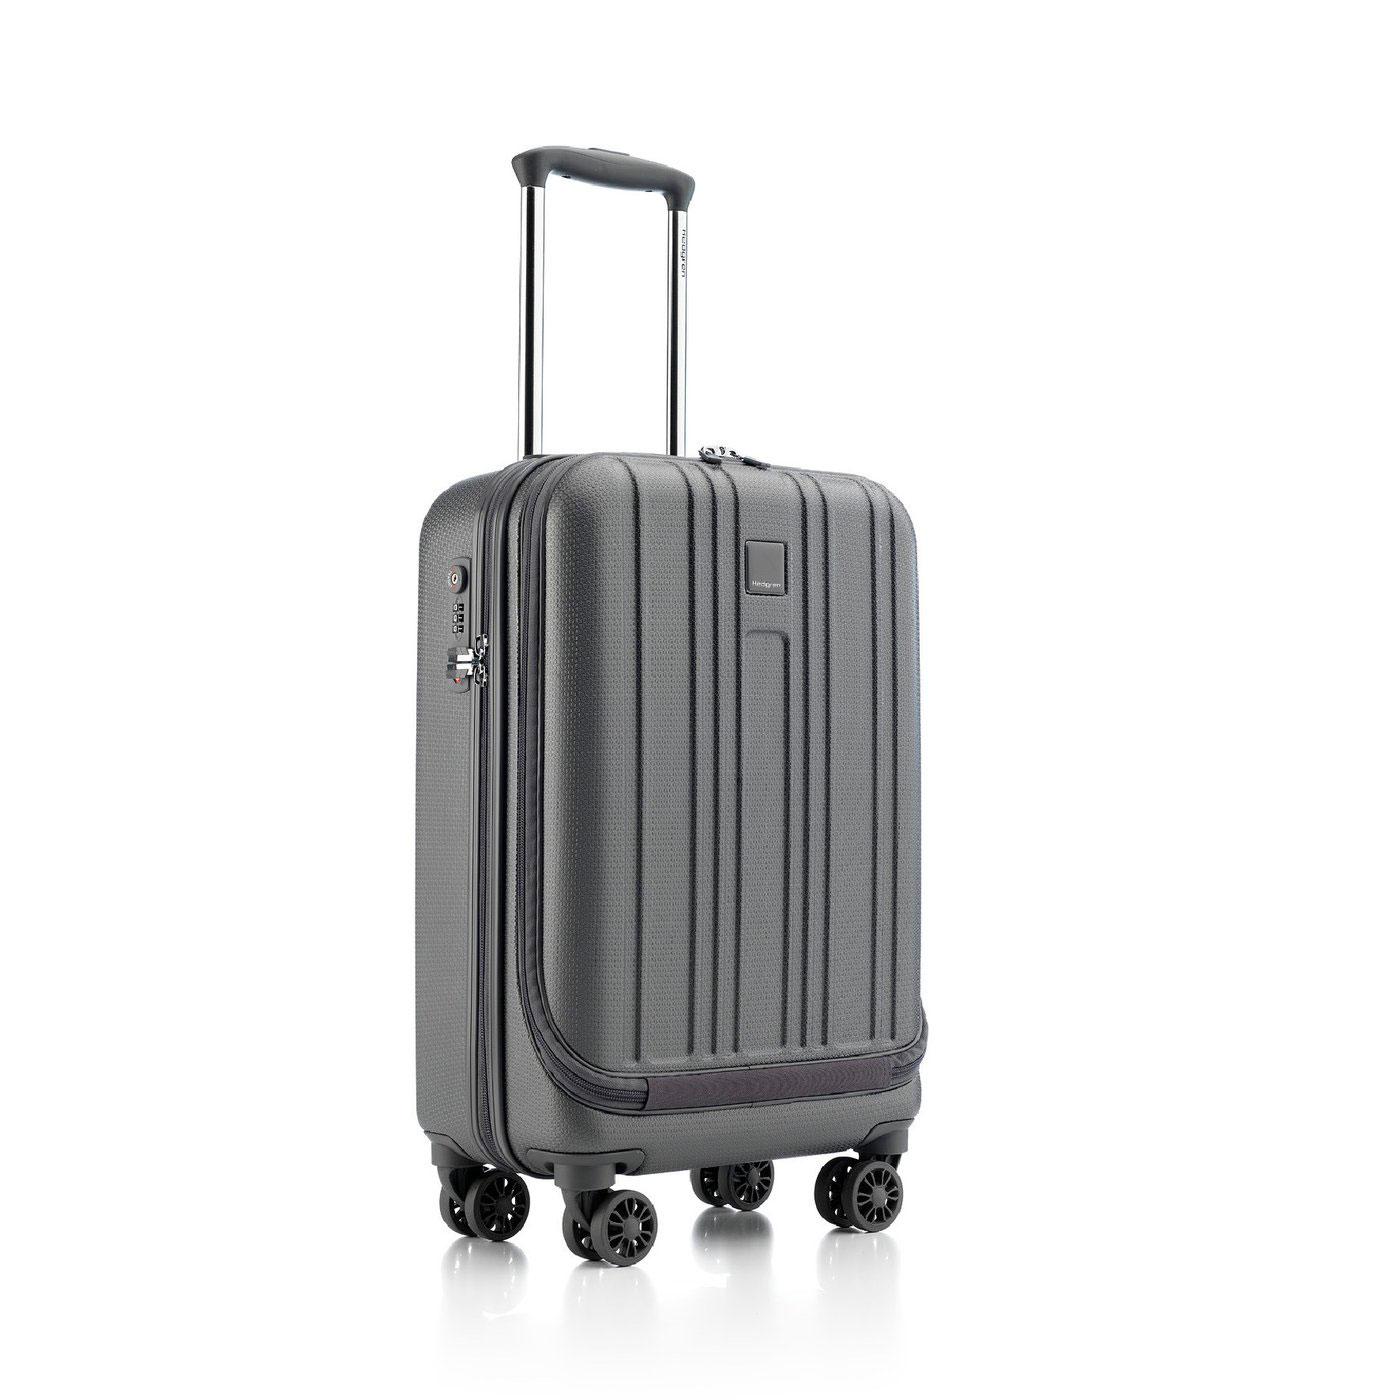 Hedgren transit boarding s gris sac sacoche housse for Valise makita avec tous ses accessoires